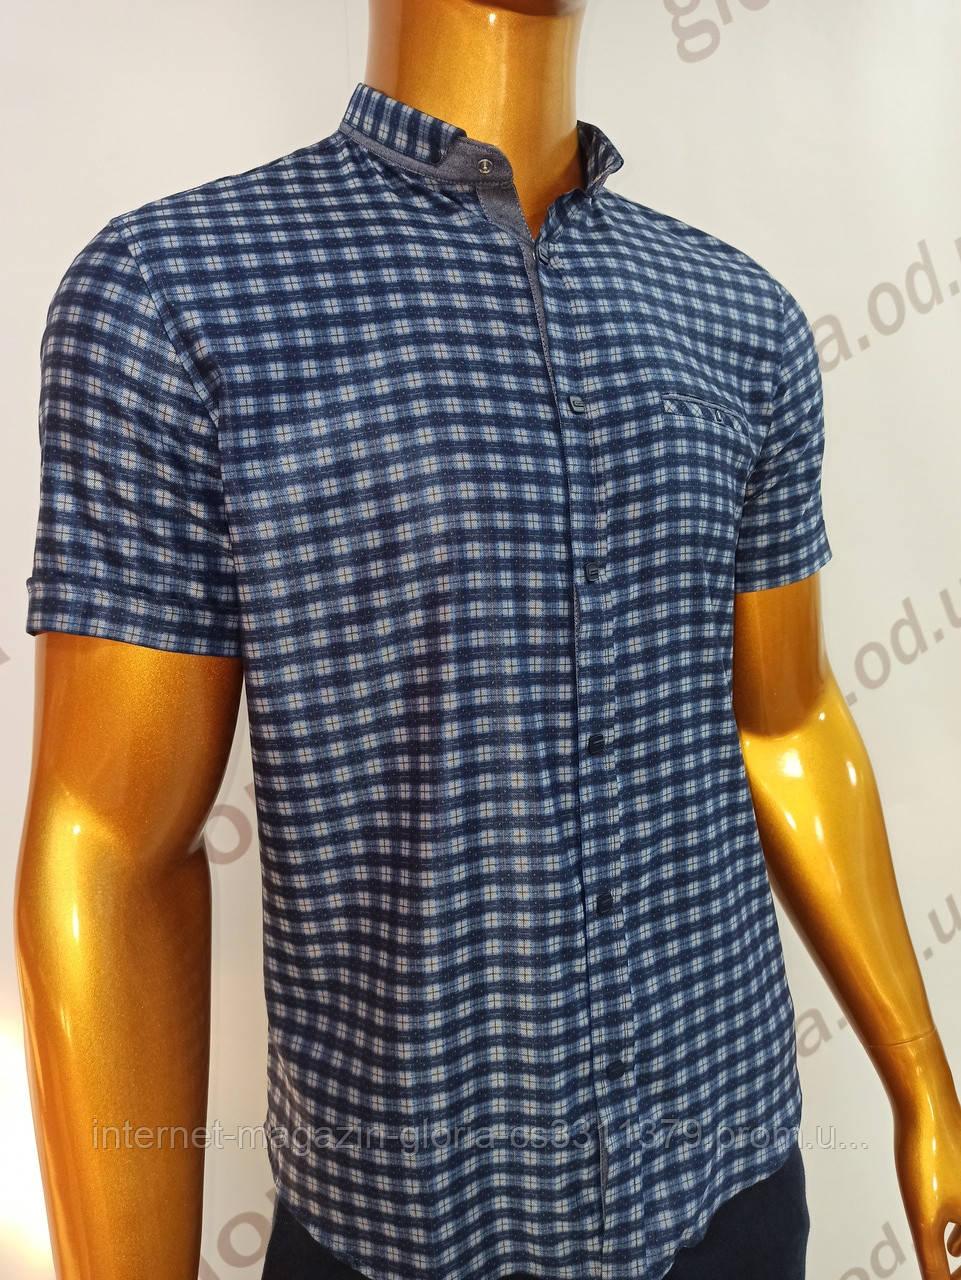 Мужская рубашка Amato. AG.KG19374-v03. Размеры: L,XL,XXL.